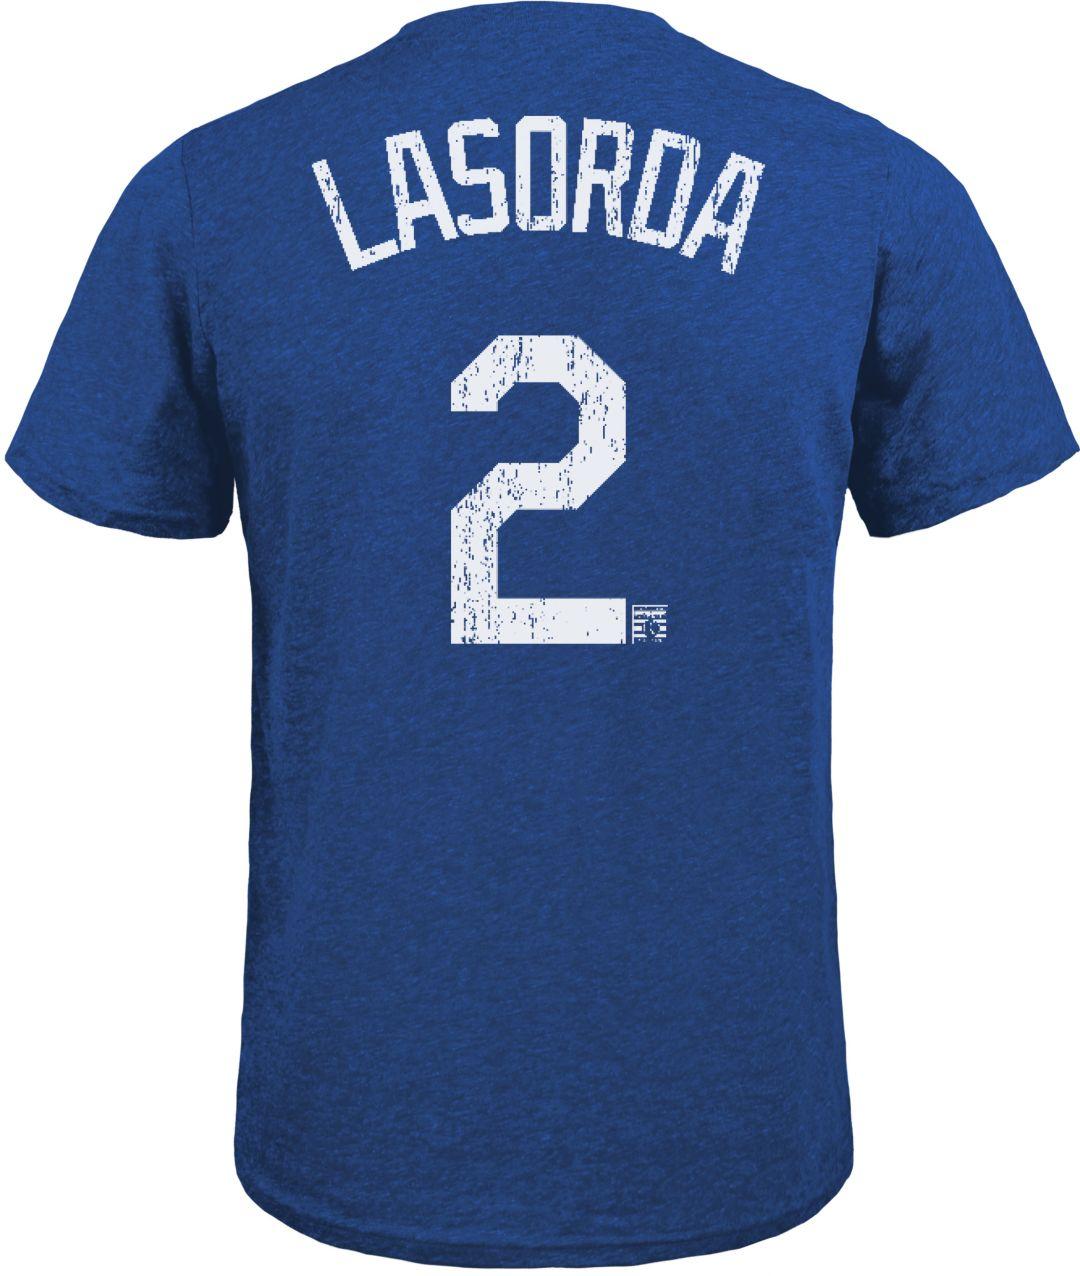 3b4419c4 Majestic Threads Men's Los Angeles Dodgers Tommy Lasorda Tri-Blend T-Shirt